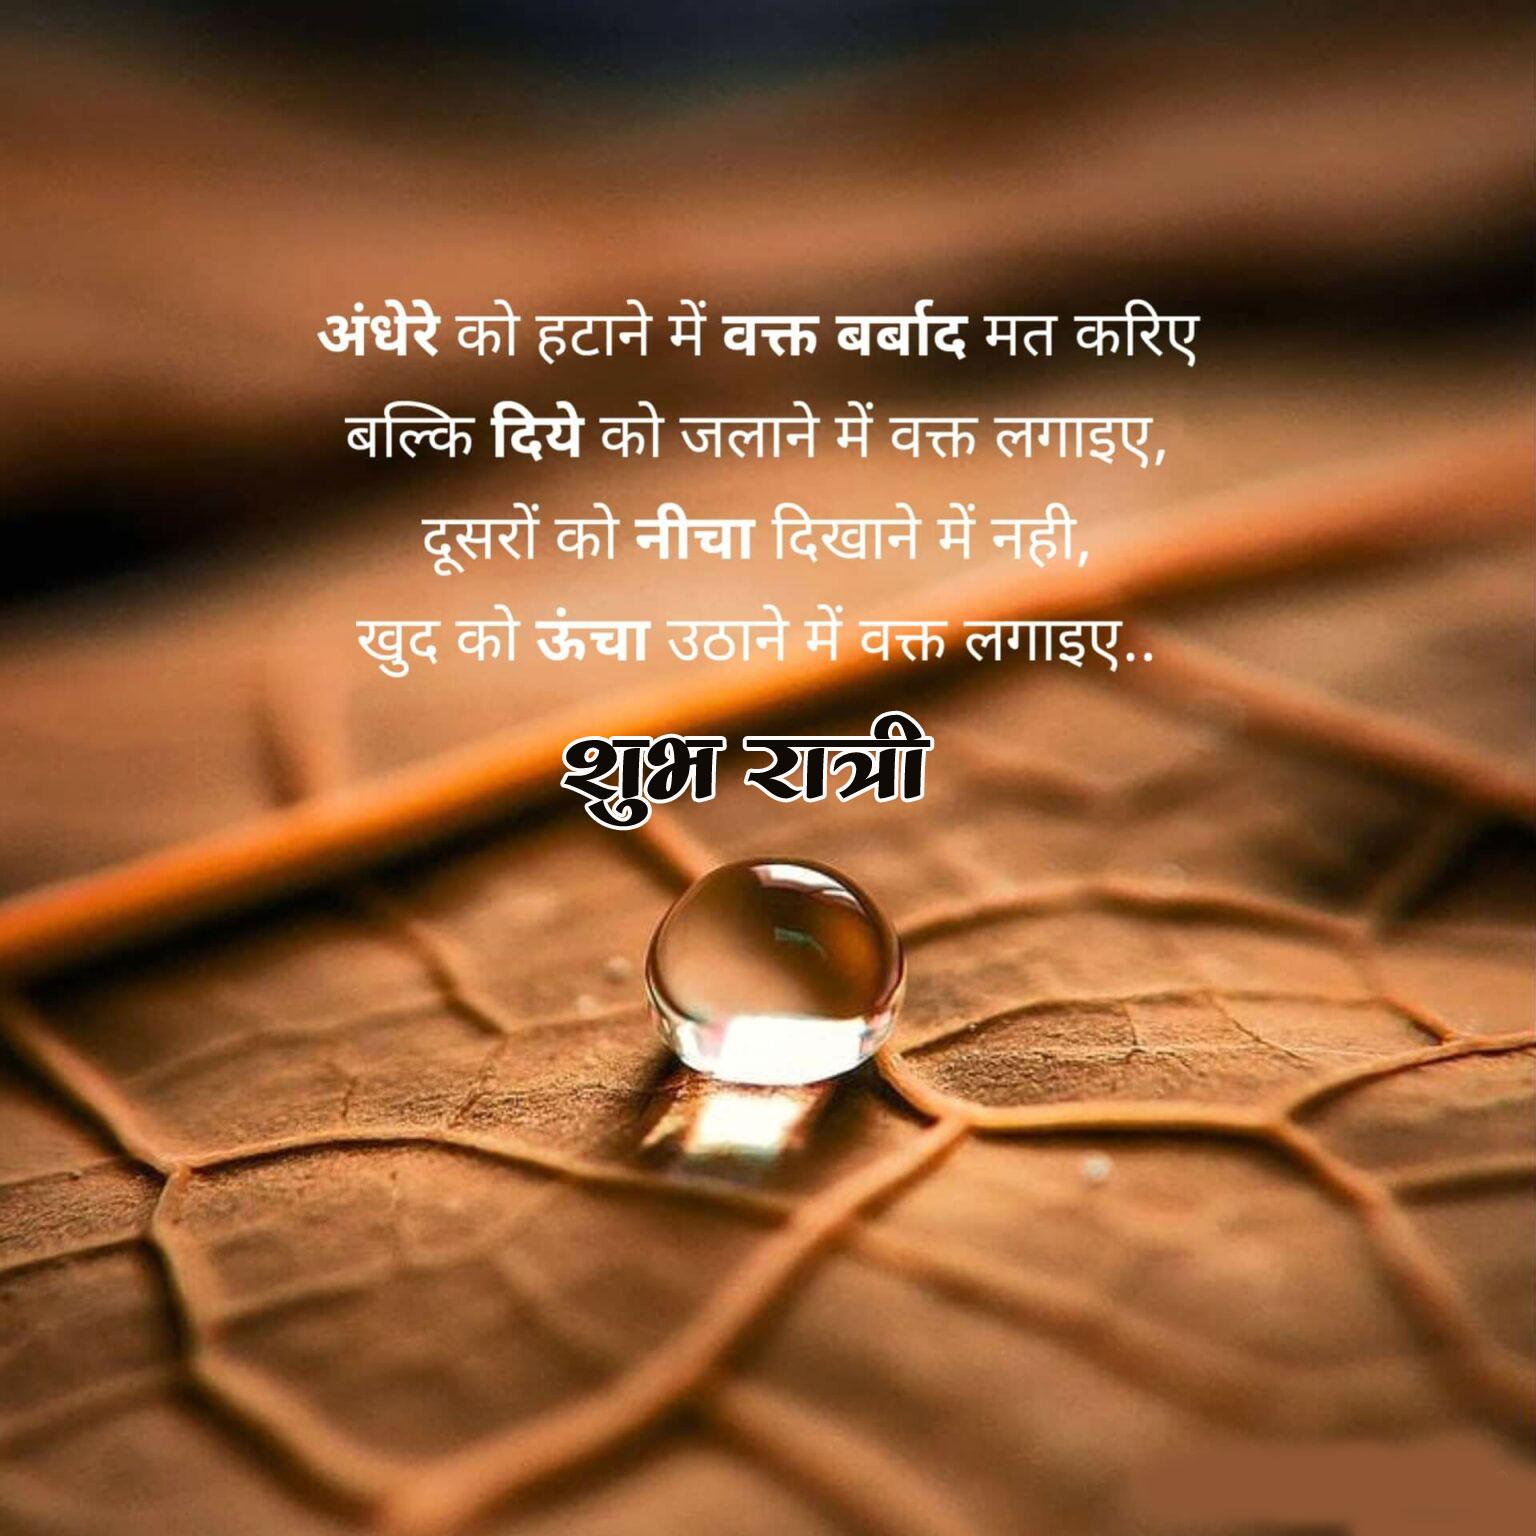 hindi Best Subh Ratri Images